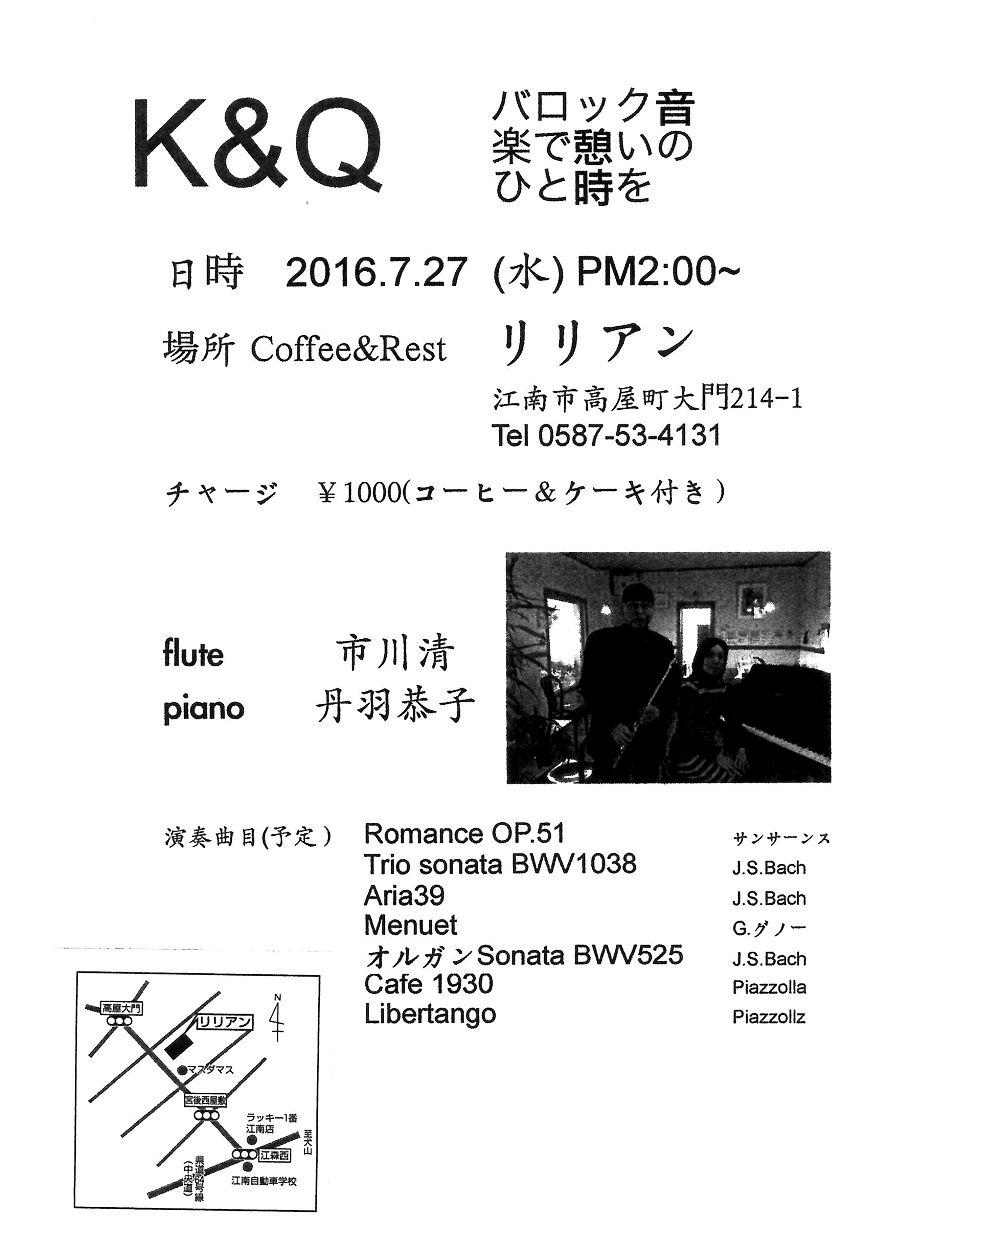 KQ001